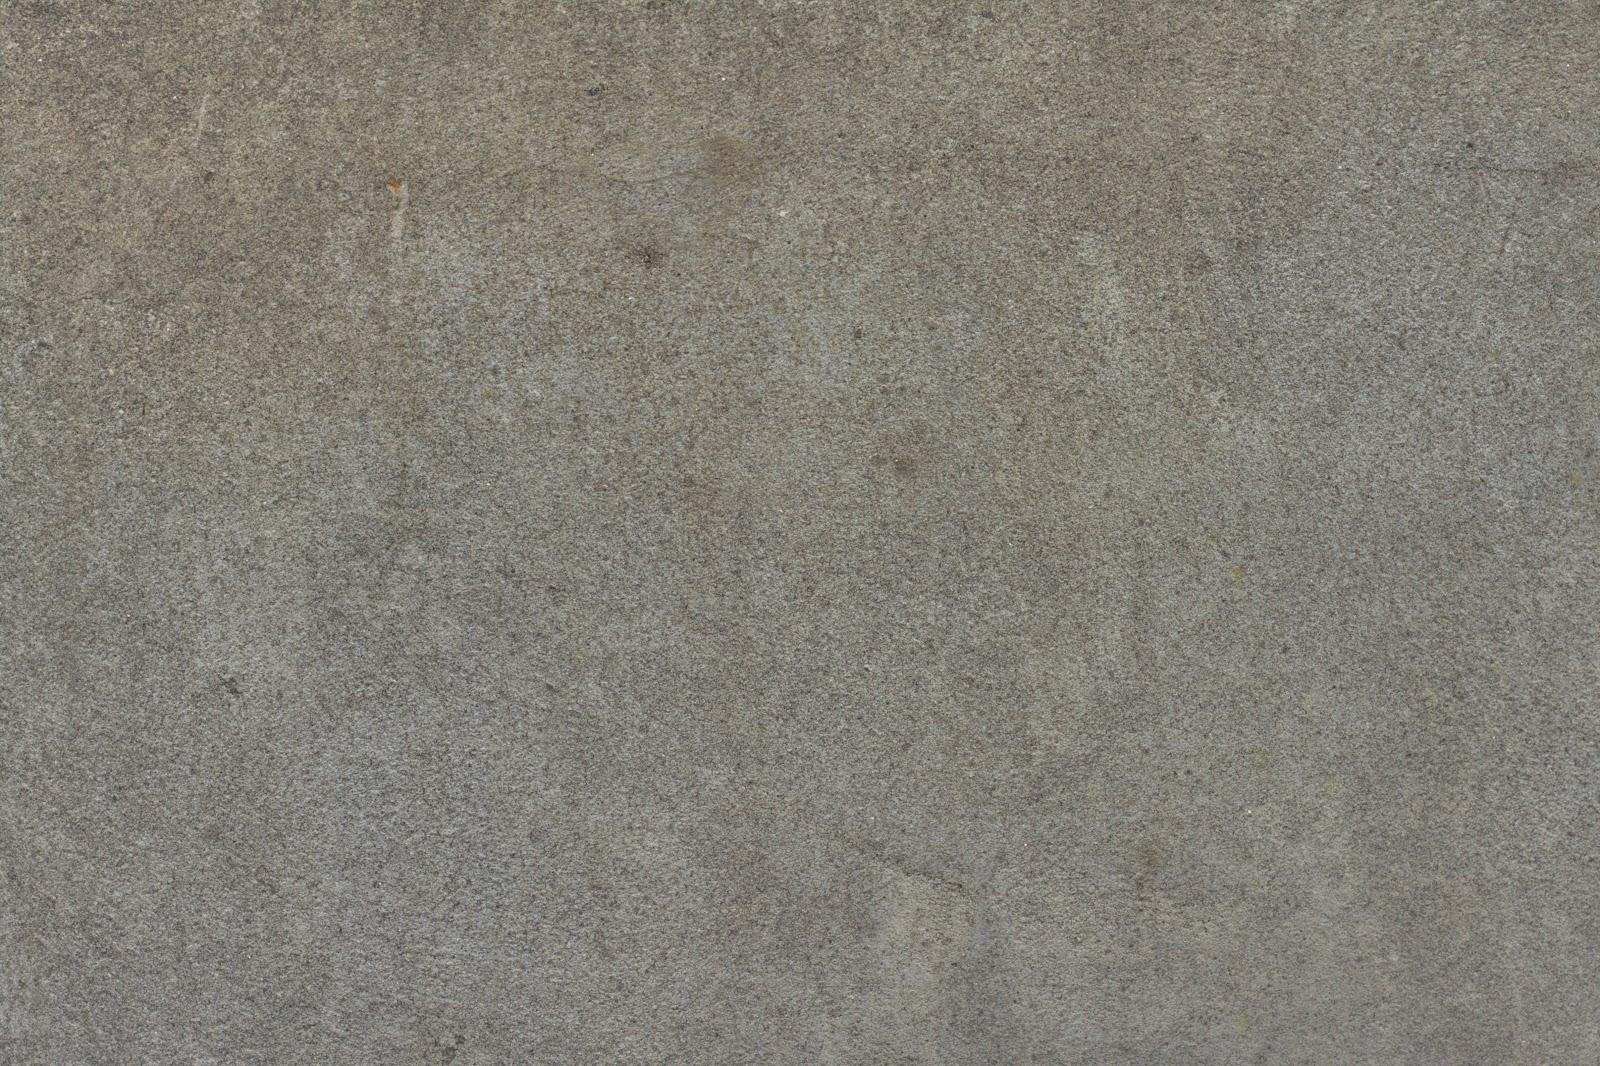 Granite floor texture seamless